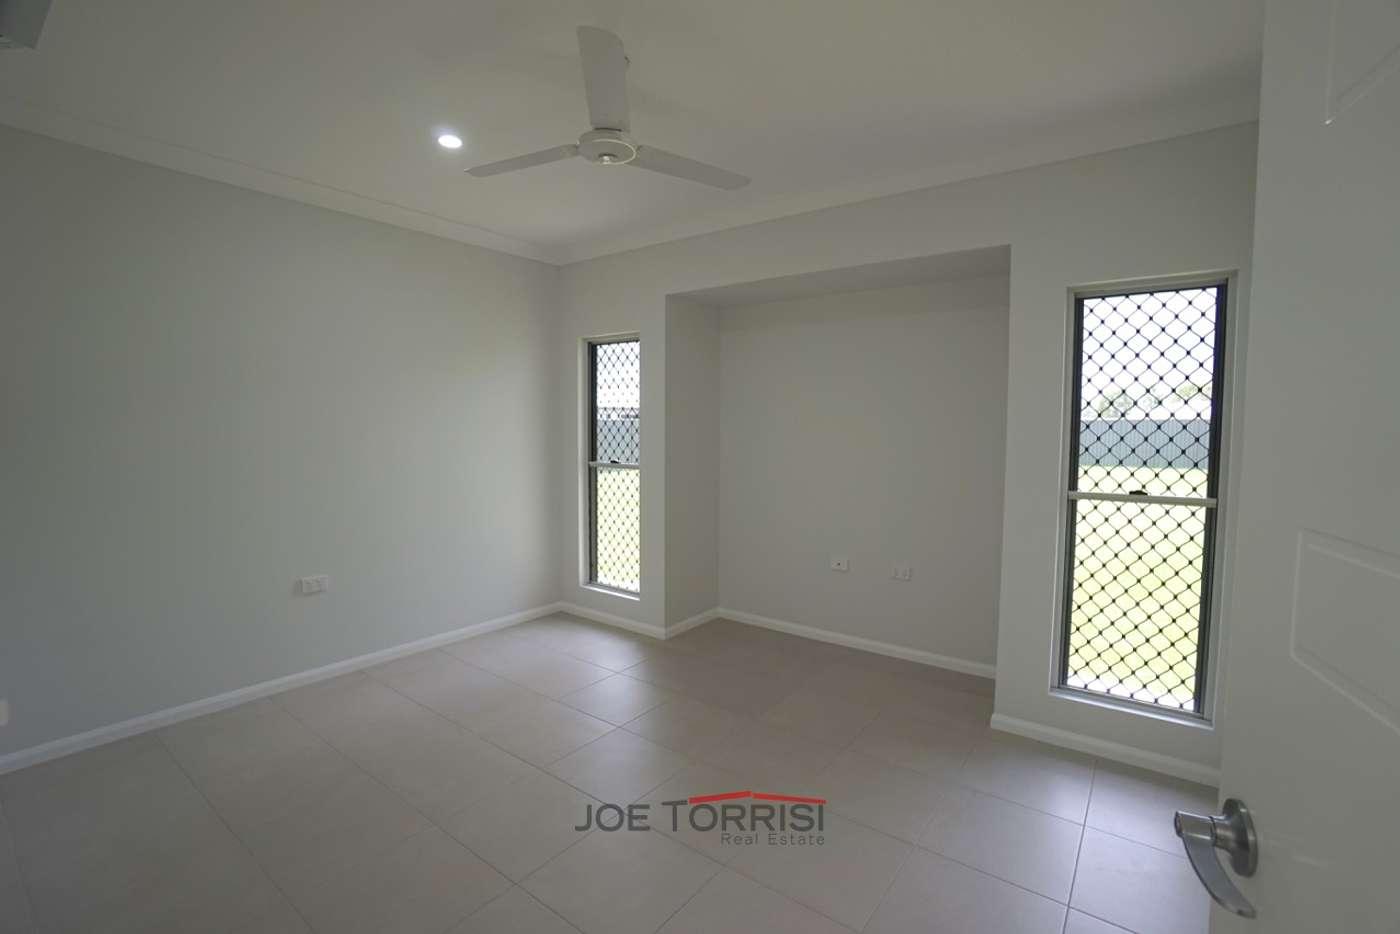 Sixth view of Homely house listing, 12 Moondani Avenue, Mareeba QLD 4880